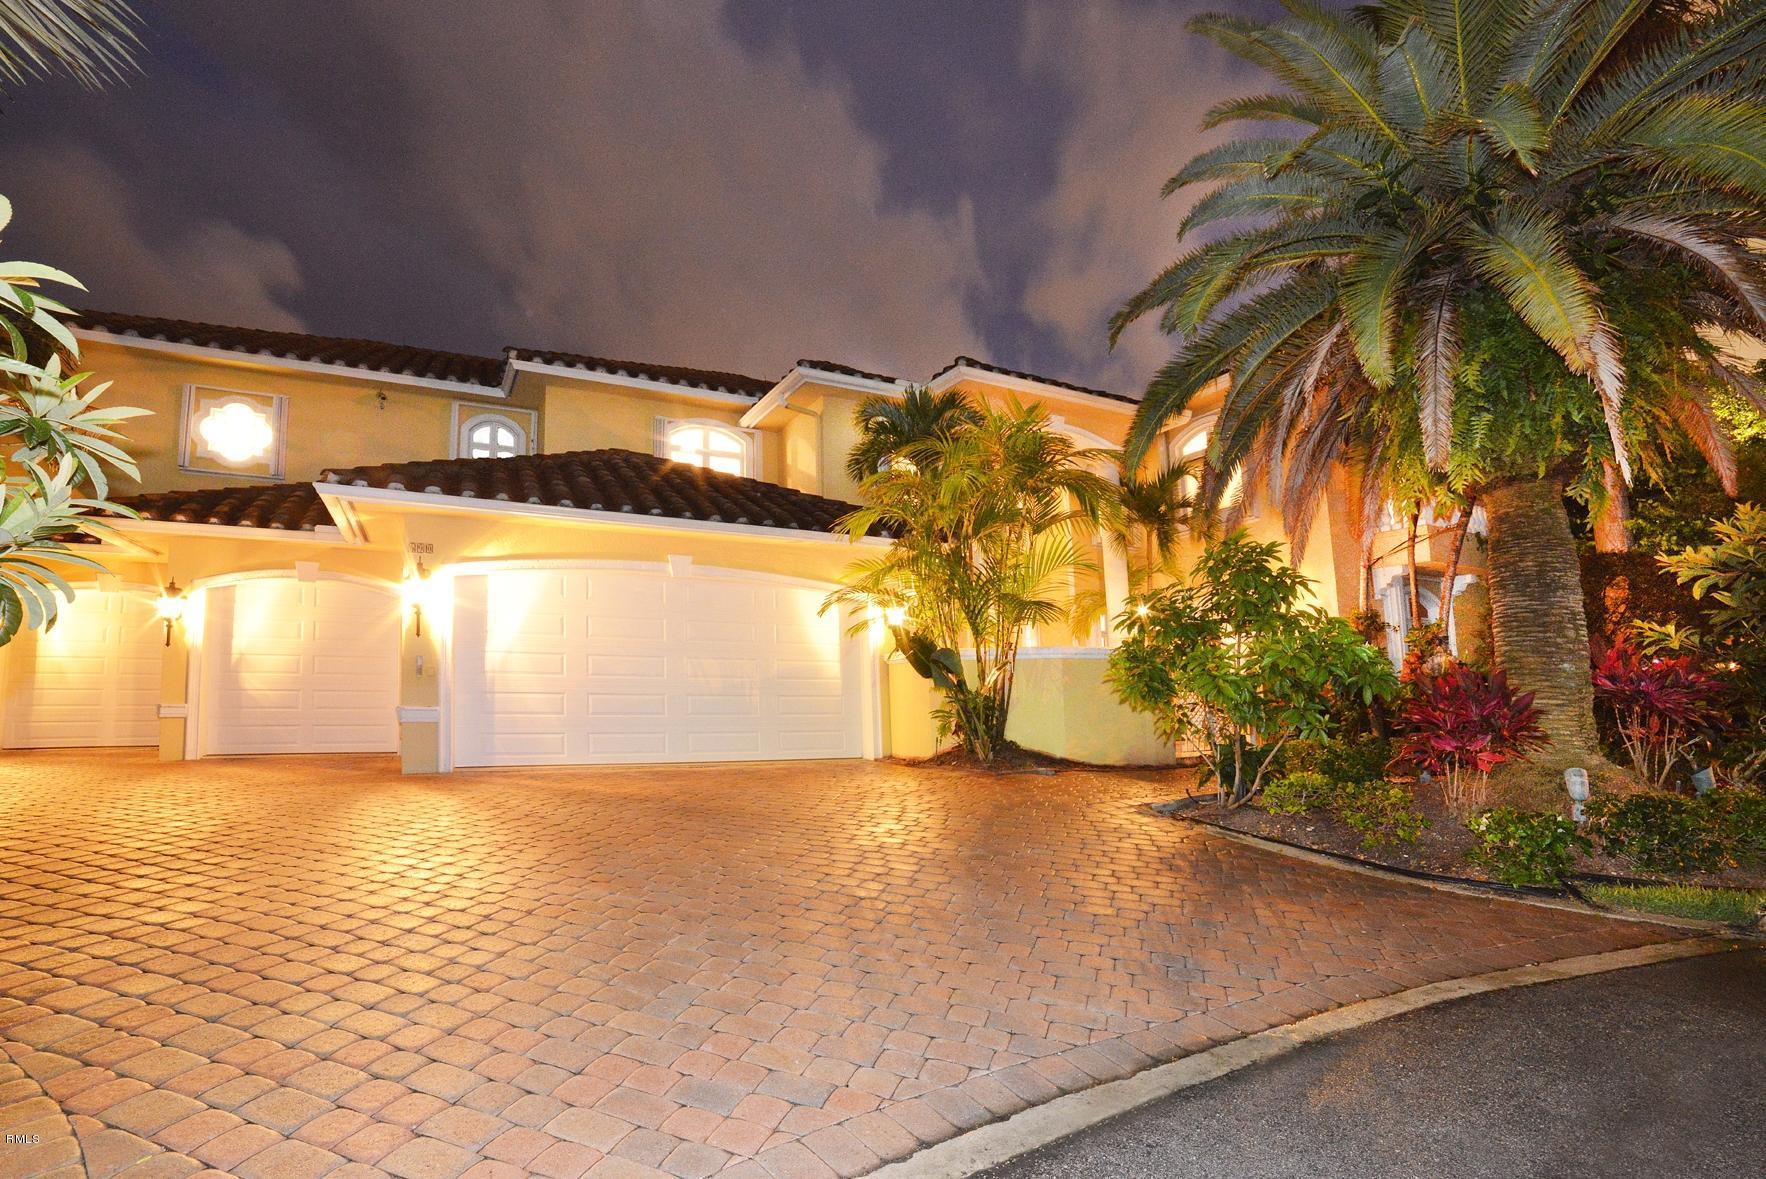 690 Golden Harbour Drive, Boca Raton, FL 33432 (MLS# RX-9958320